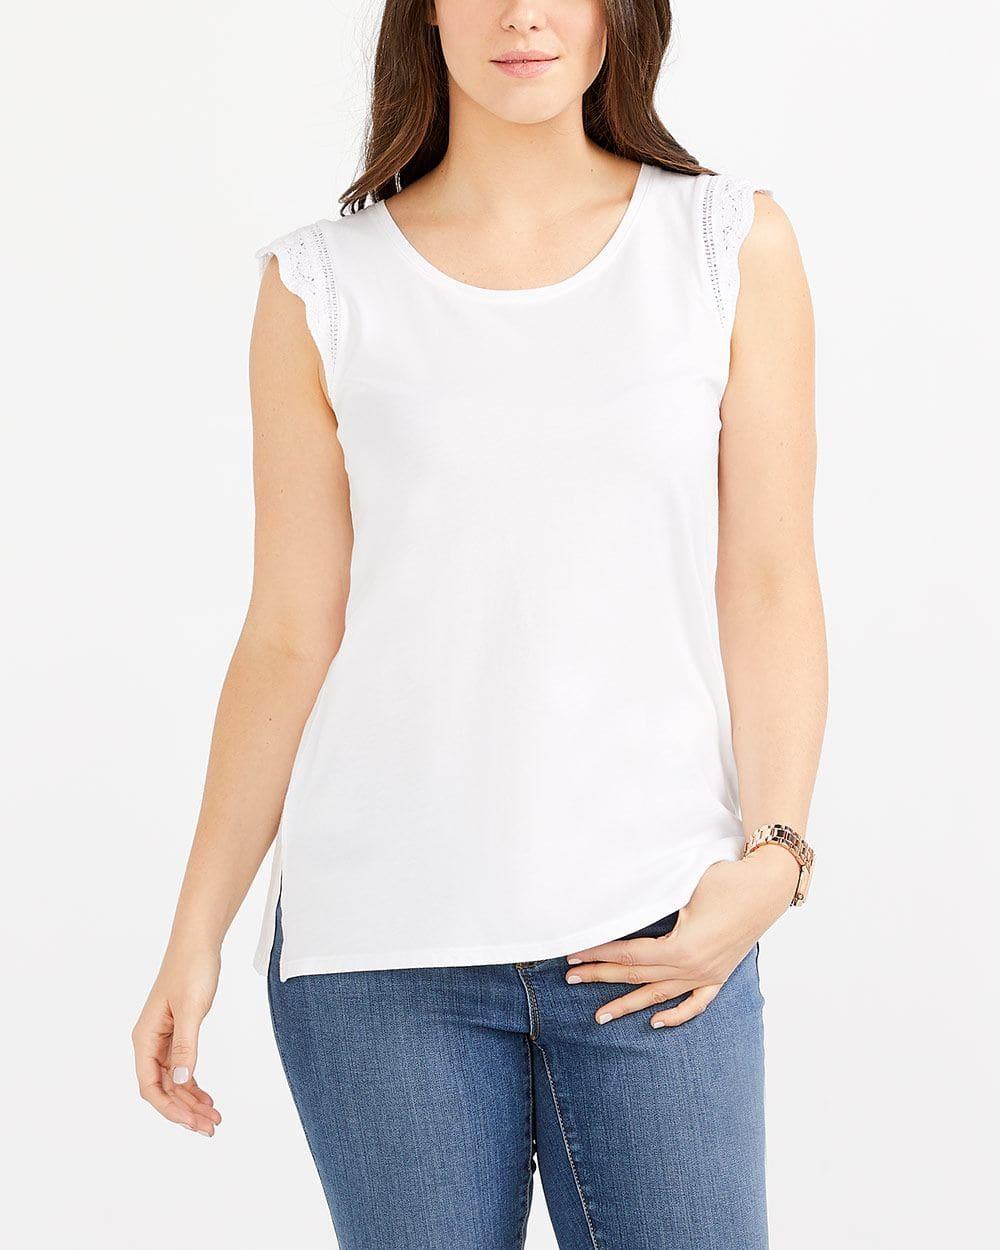 T-shirt avec dentelle crochetée